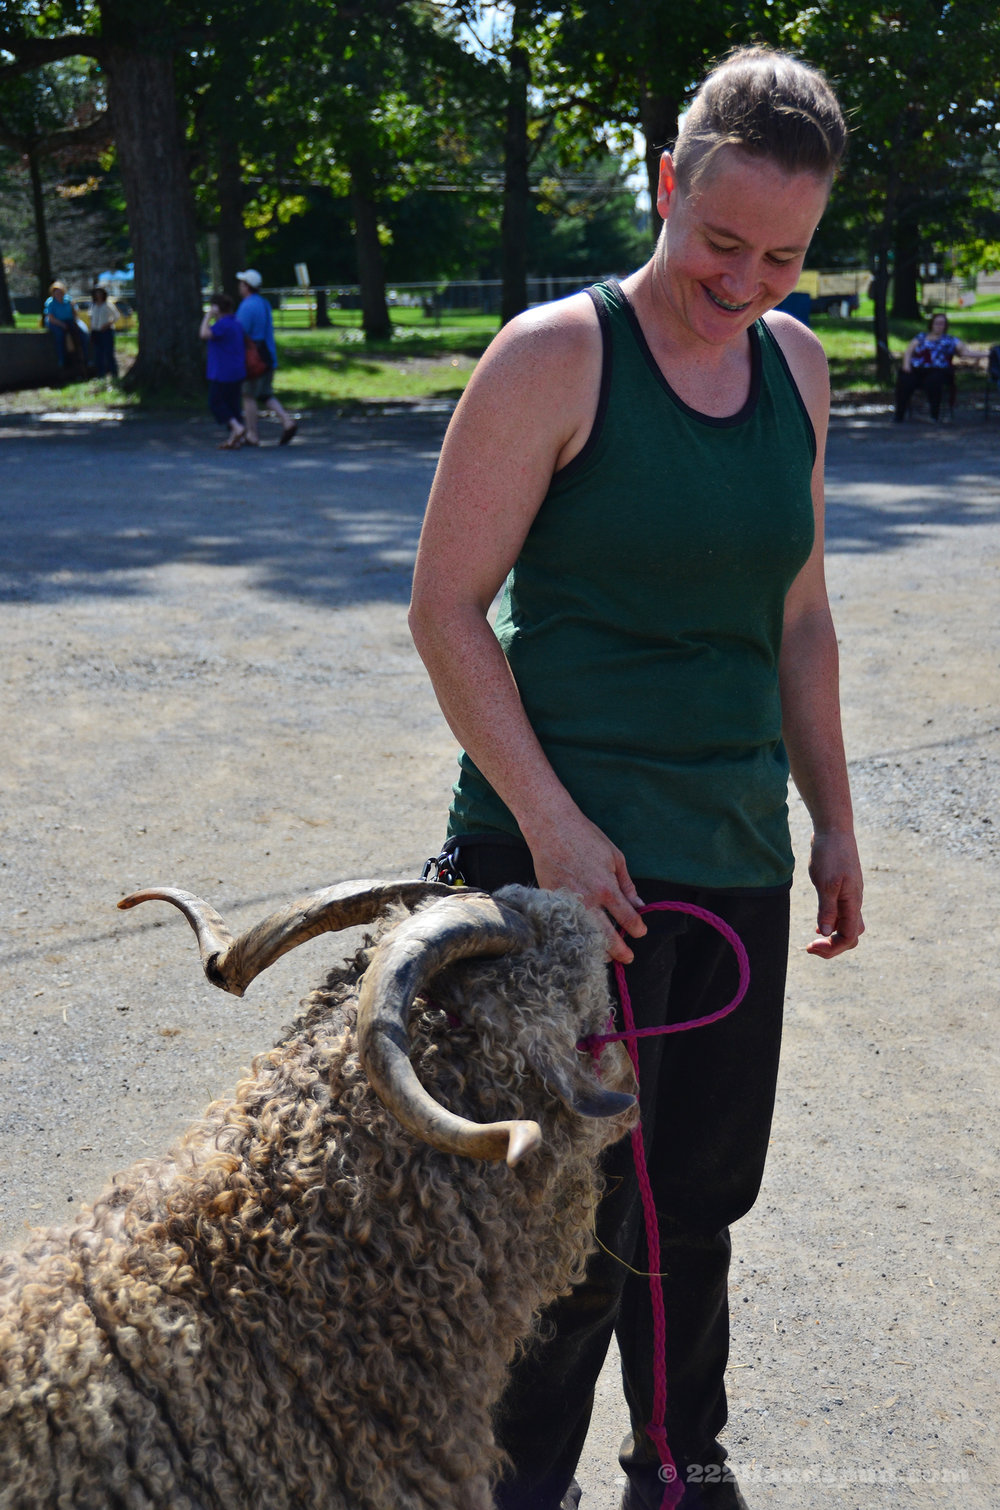 Emily Getting Ready to Shear an Angora Goat